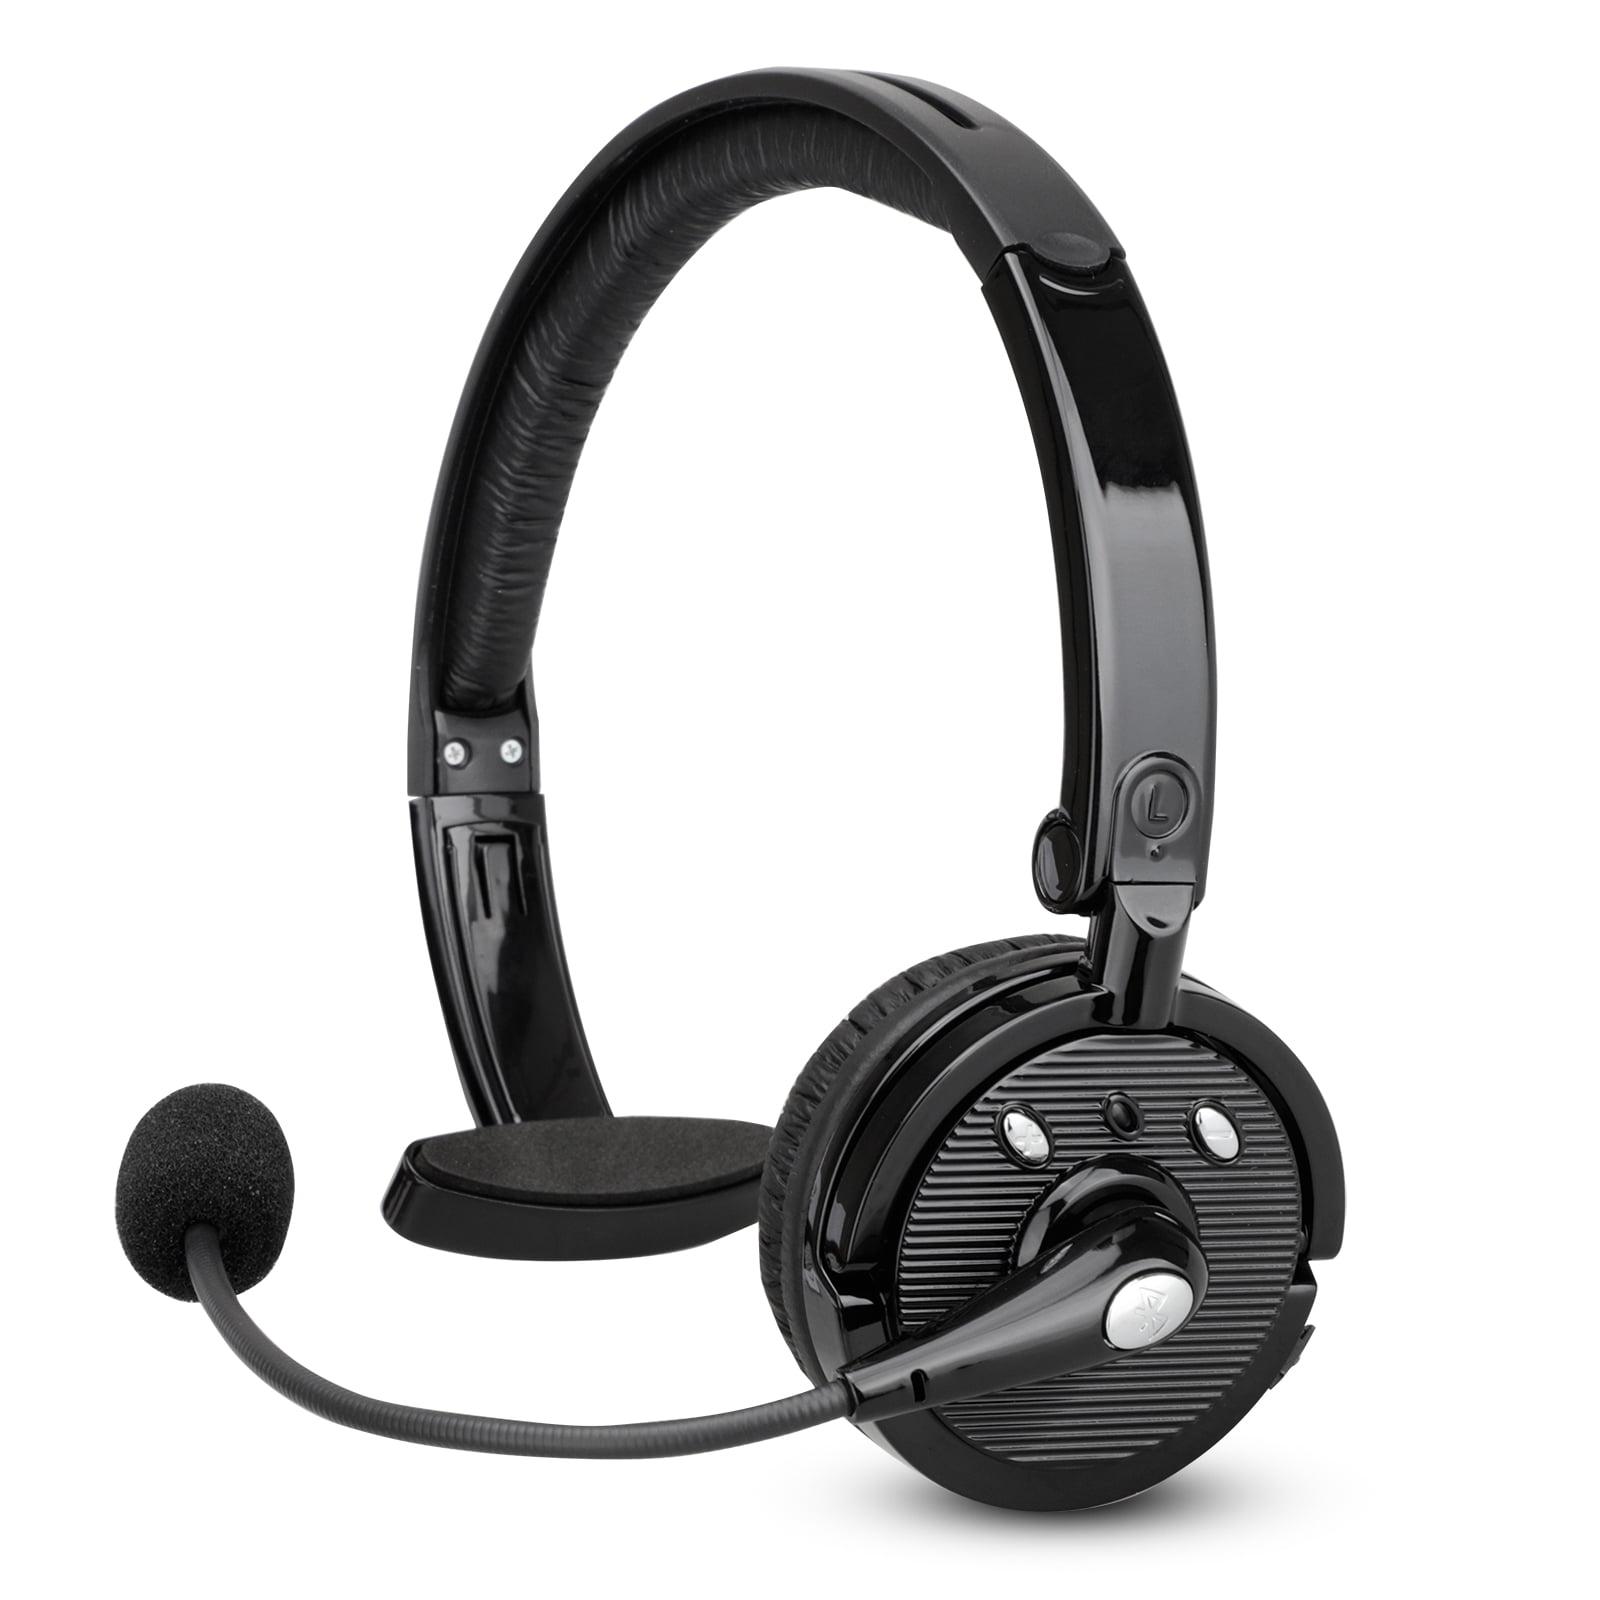 EEEKit Bluetooth Headset, Wireless Headset High Voice